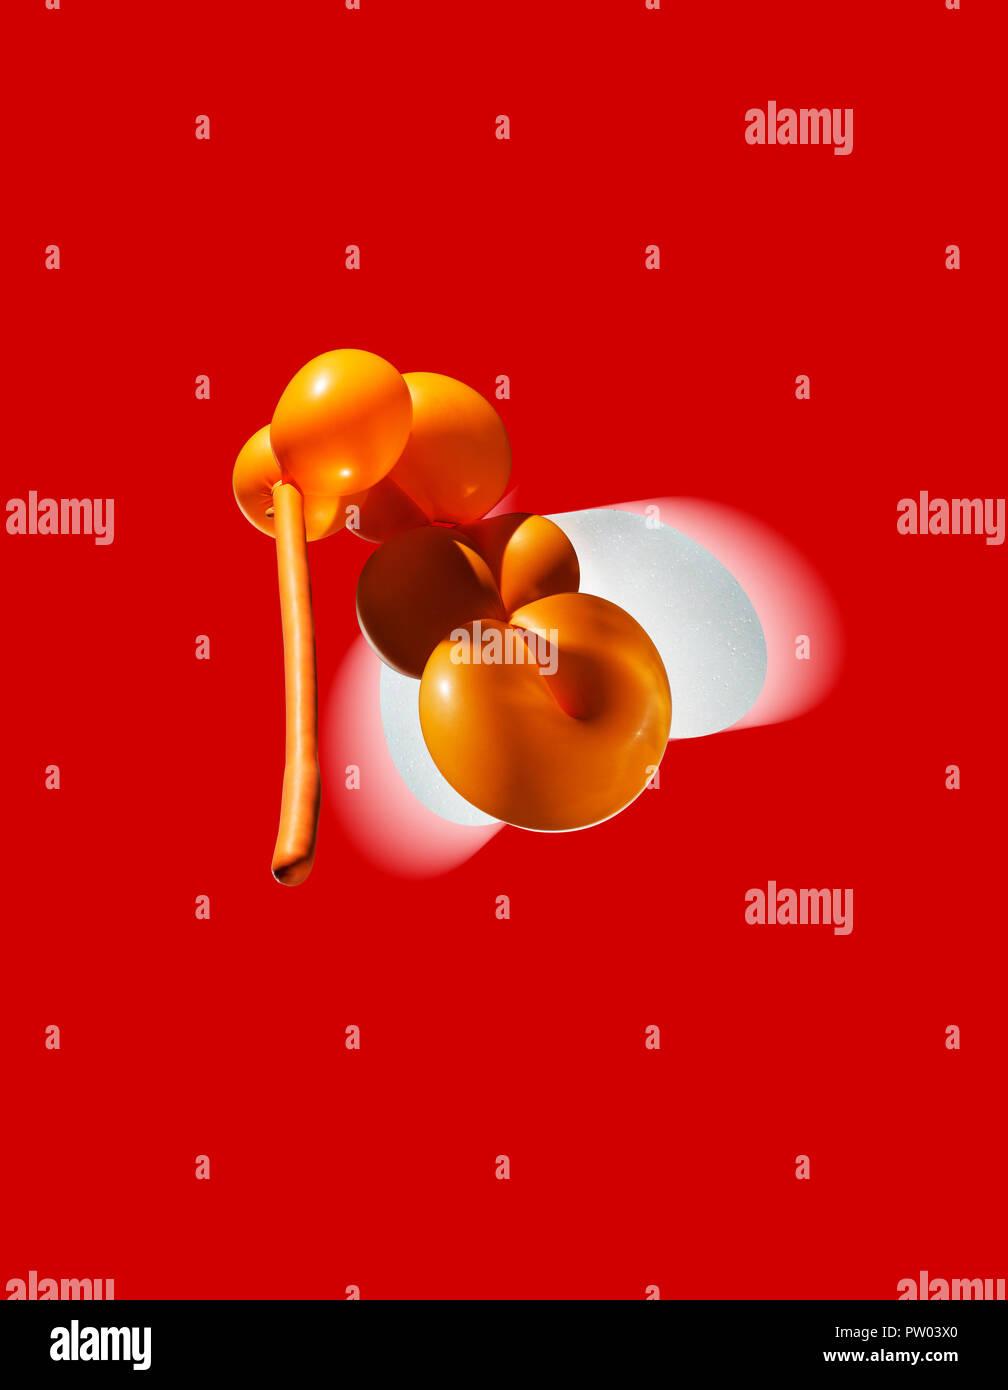 Konzept Moskito in einem Ballon Form, Zika Virus, Infektion Stockbild